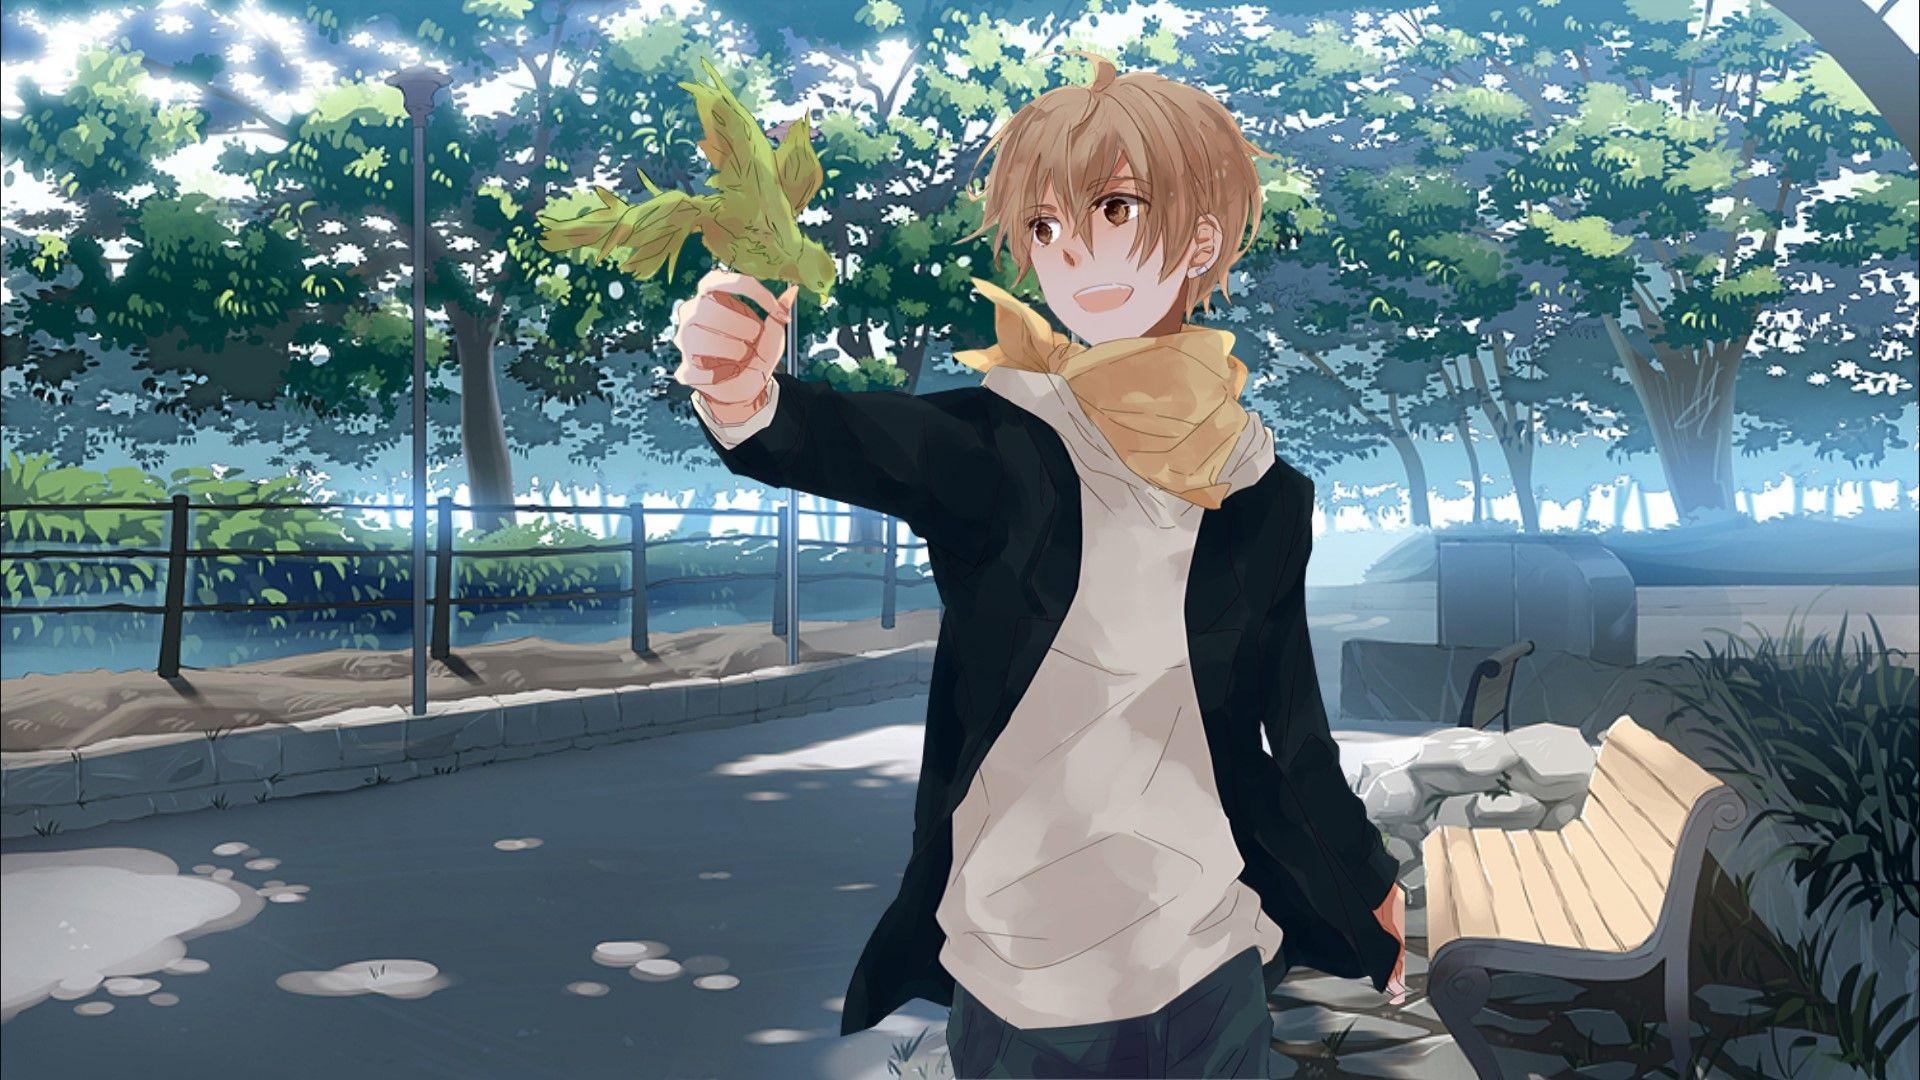 Anime Boys Wallpaper ·① WallpaperTag